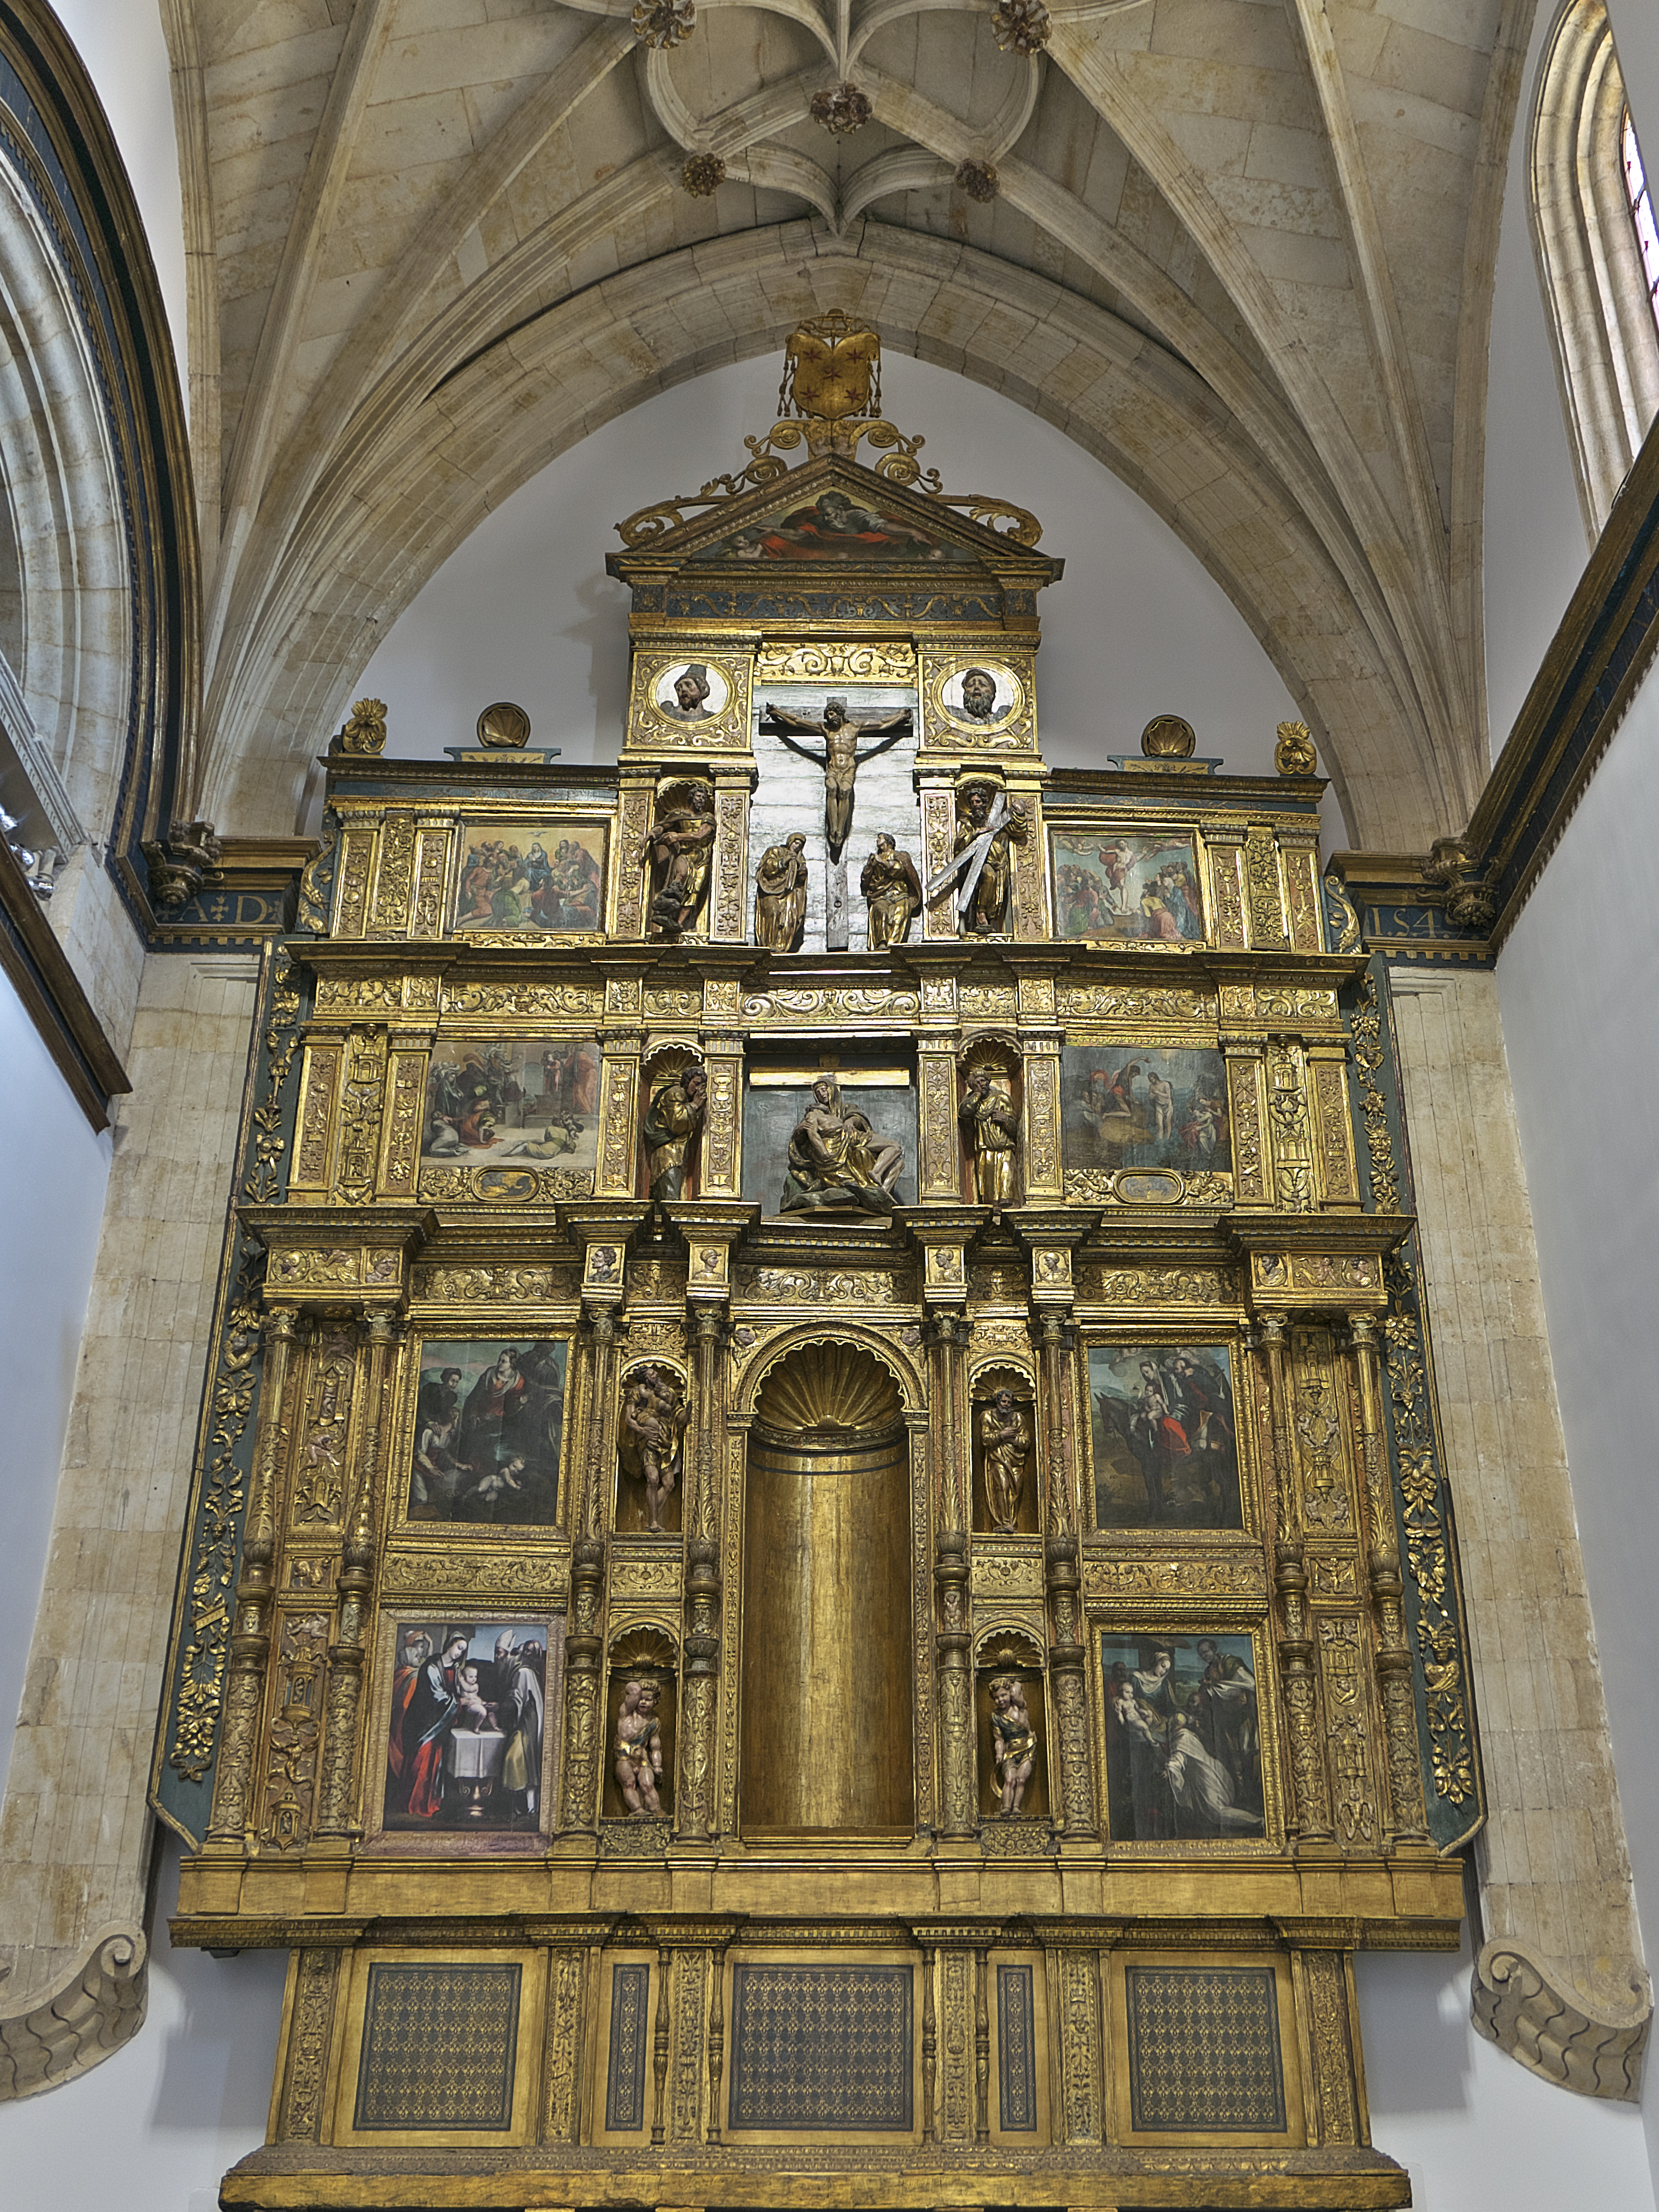 https://upload.wikimedia.org/wikipedia/commons/9/94/Retablo_mayor_de_la_capilla_del_Colegio_del_Arzobispo_Fonseca_%28Salamanca%29.jpg